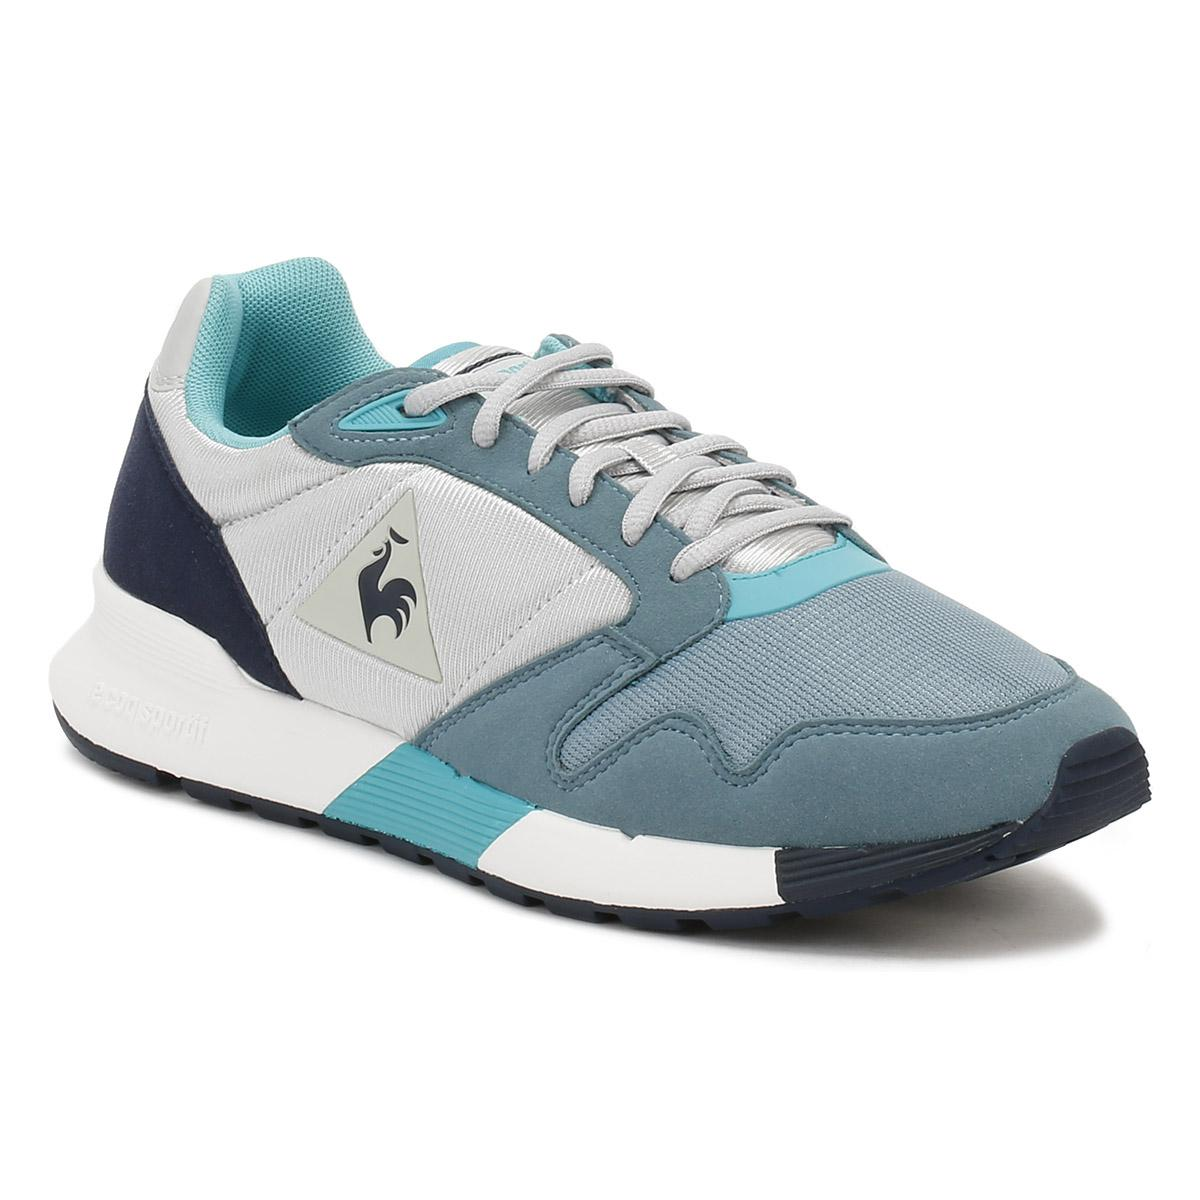 e03e8aa4283e Lyst - Le Coq Sportif Womens Galet   Smoke Blue Omega X W Trainers ...